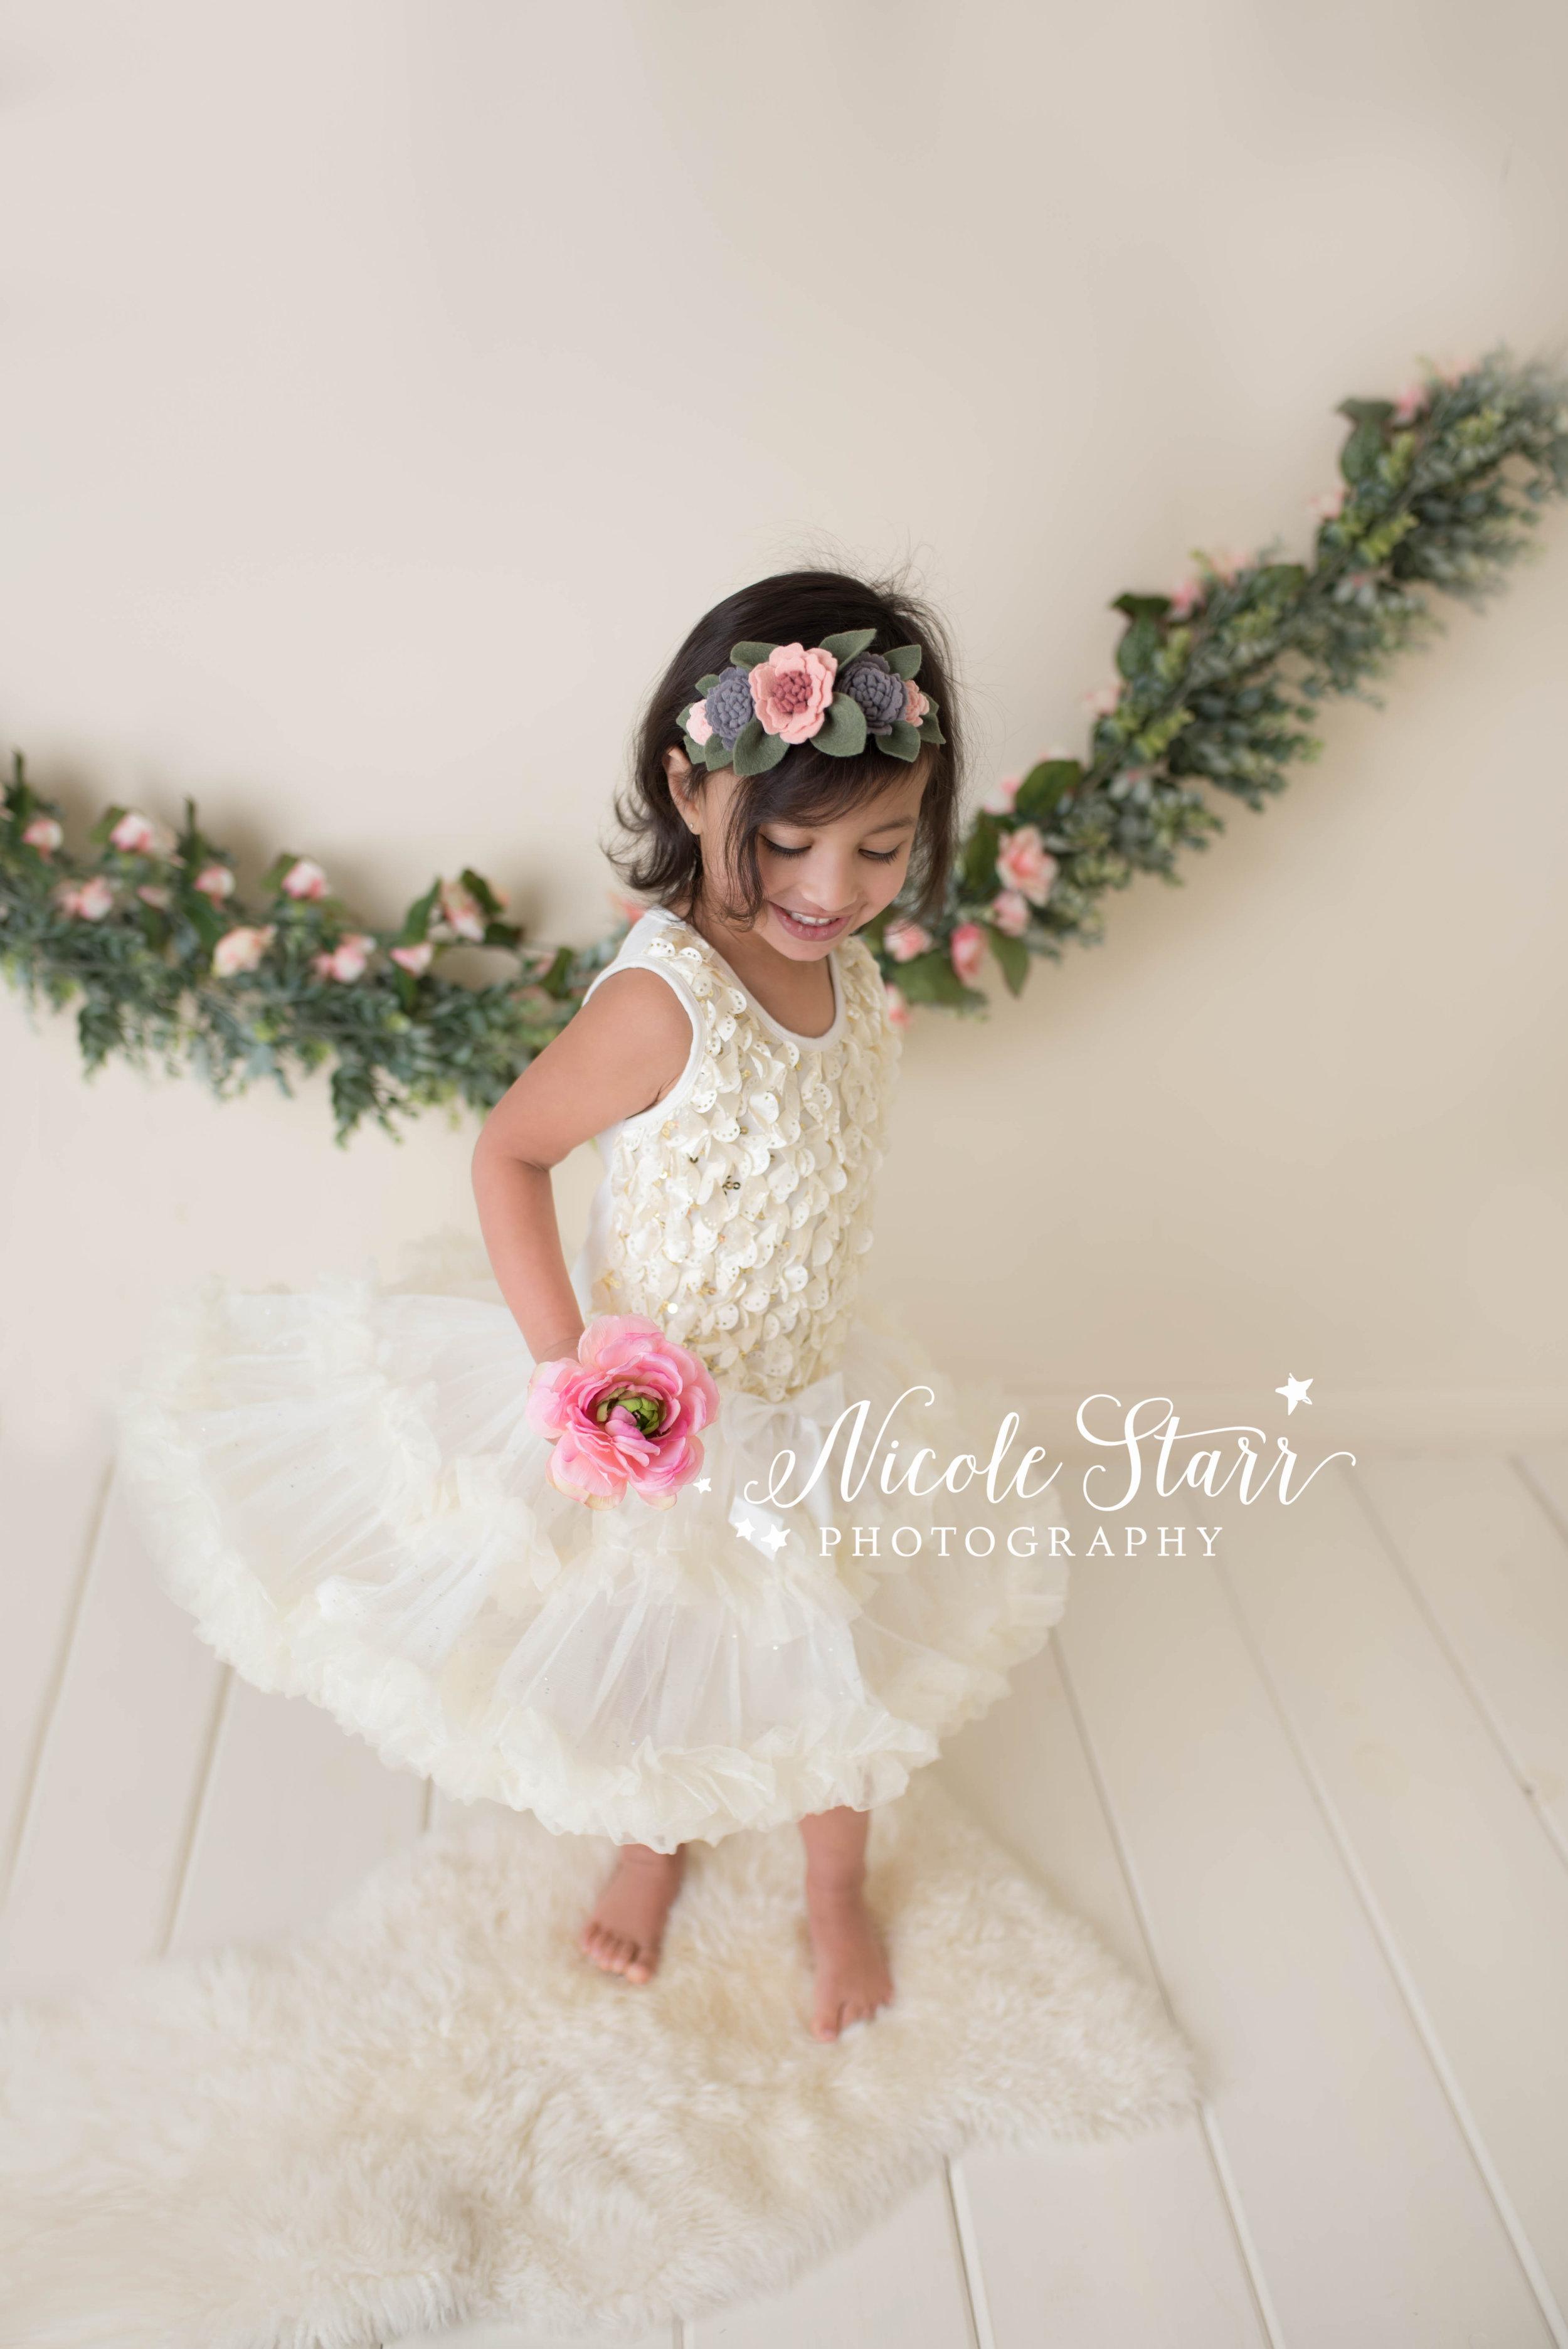 Nicole Starr Photography | Saratoga Springs, NY | Boston MA photographer | children's photographer